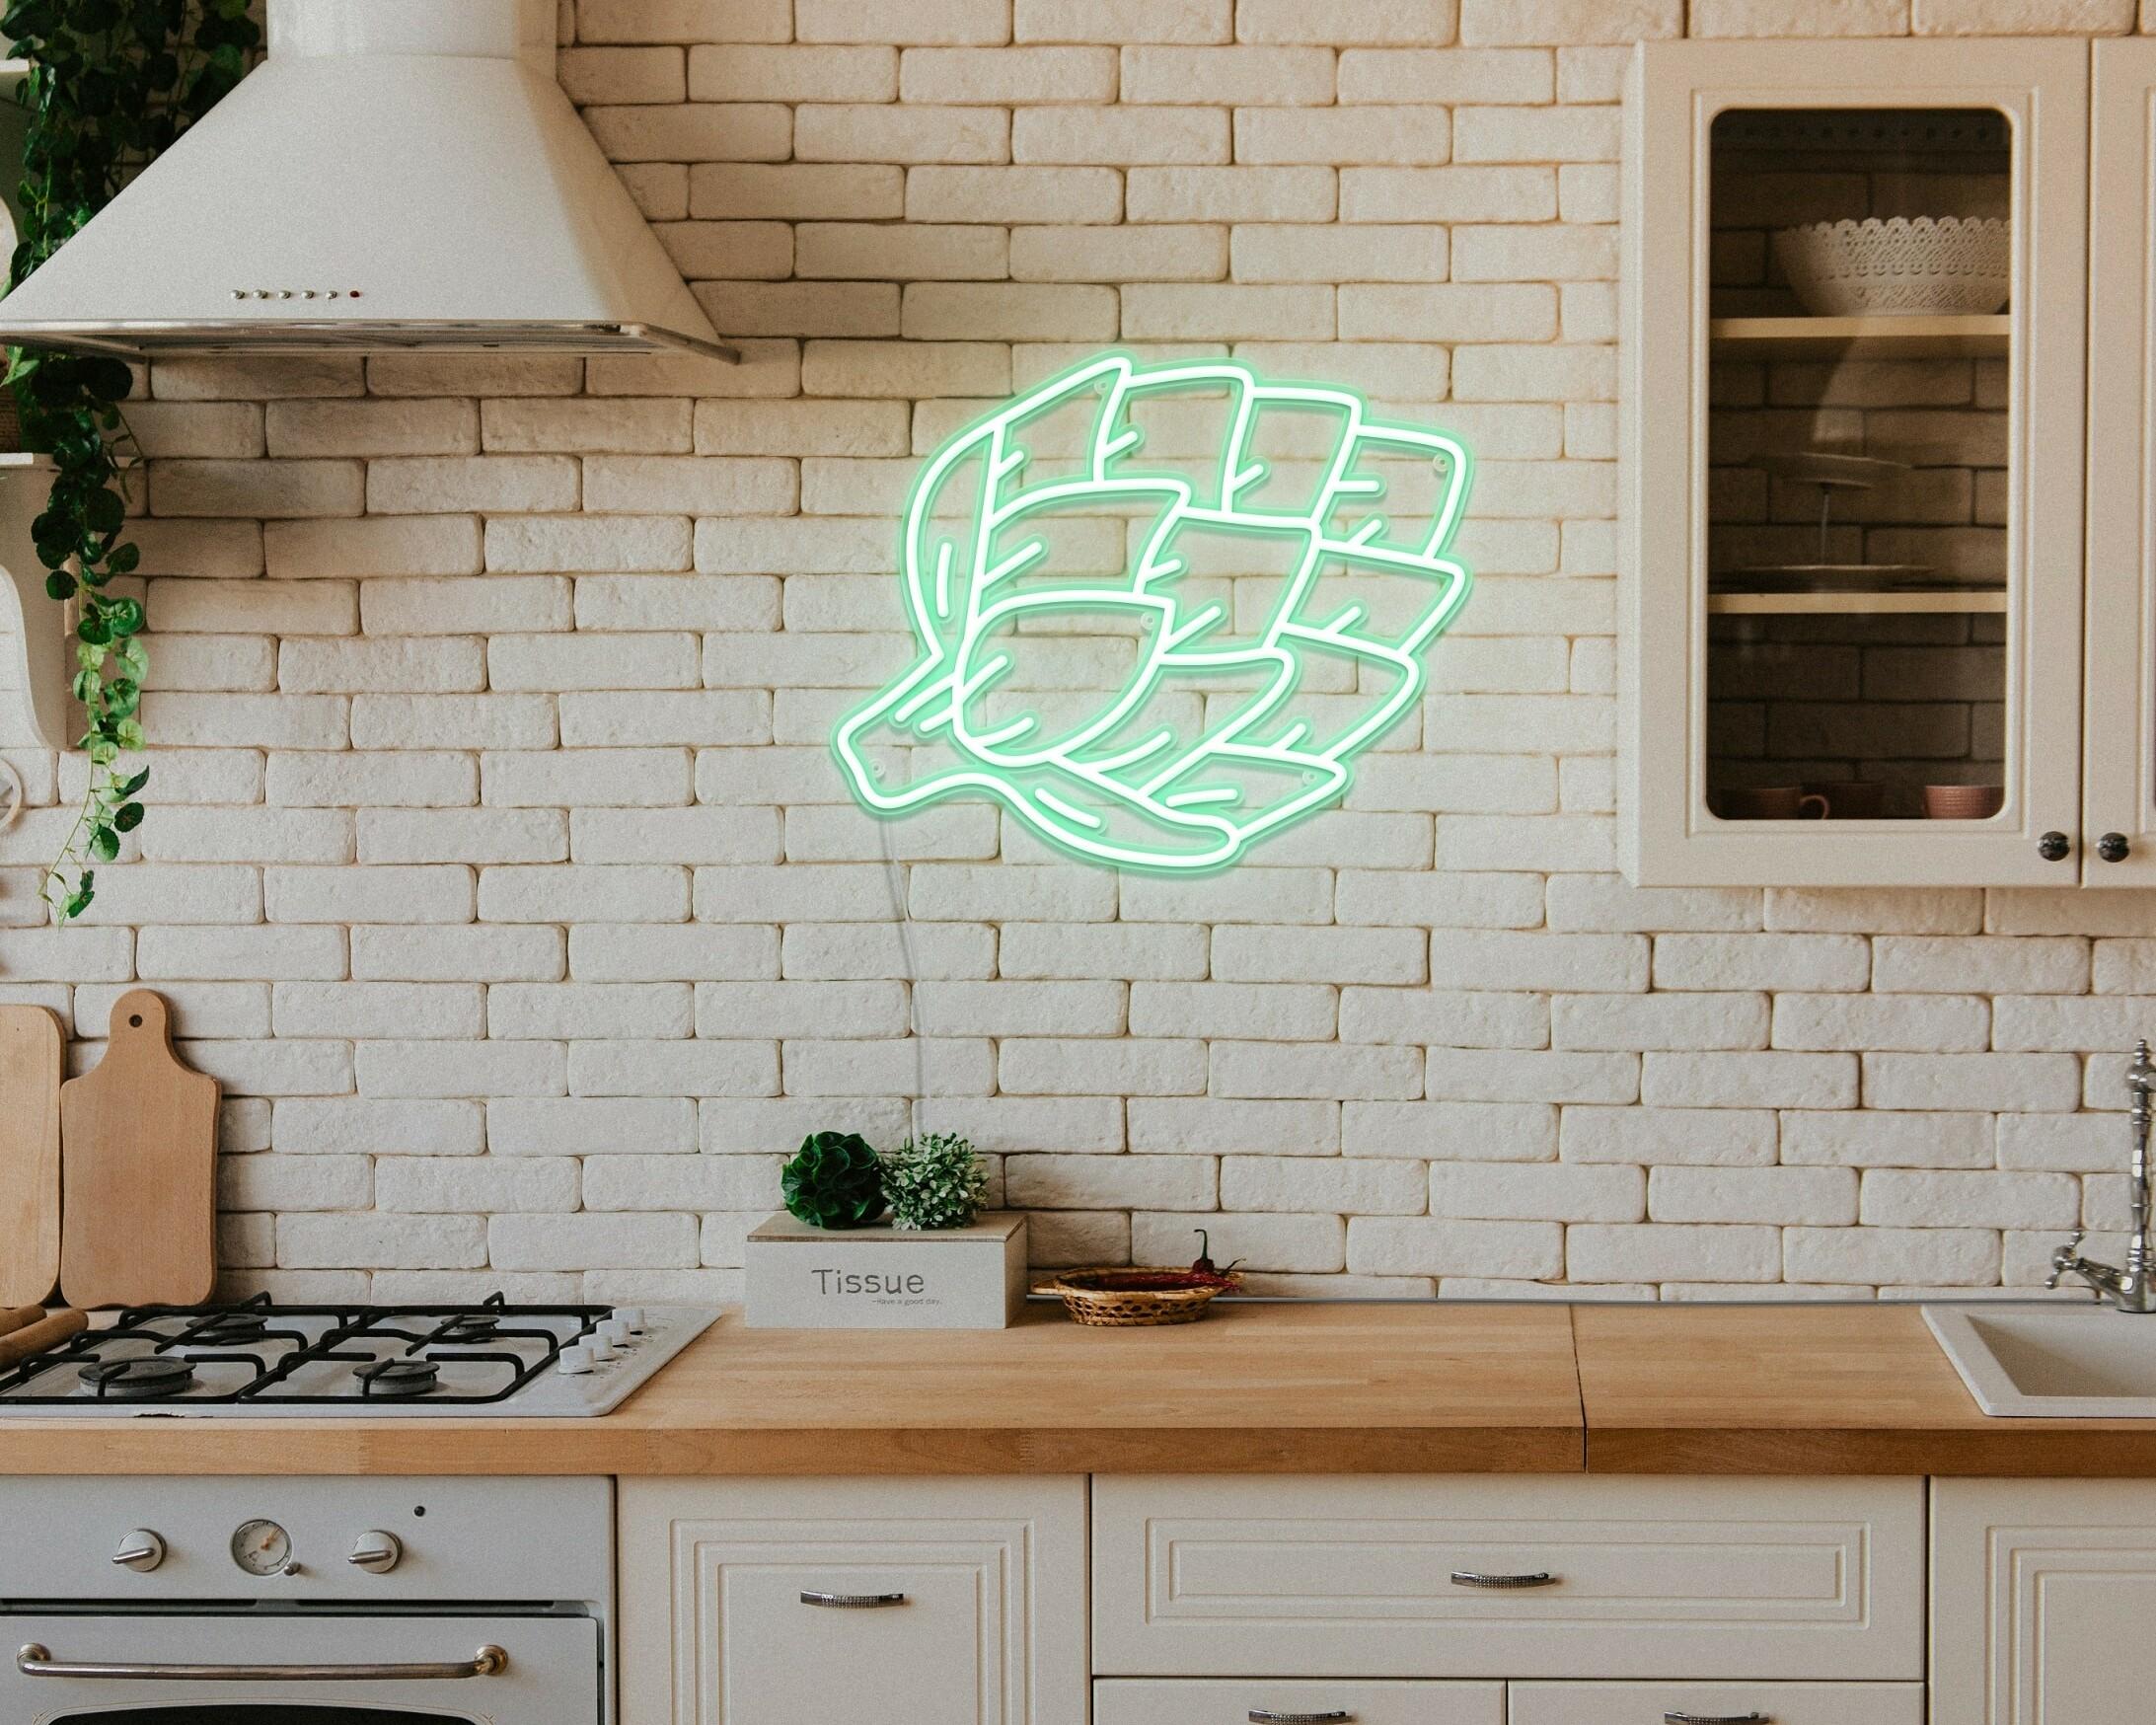 Artichoke neon sign